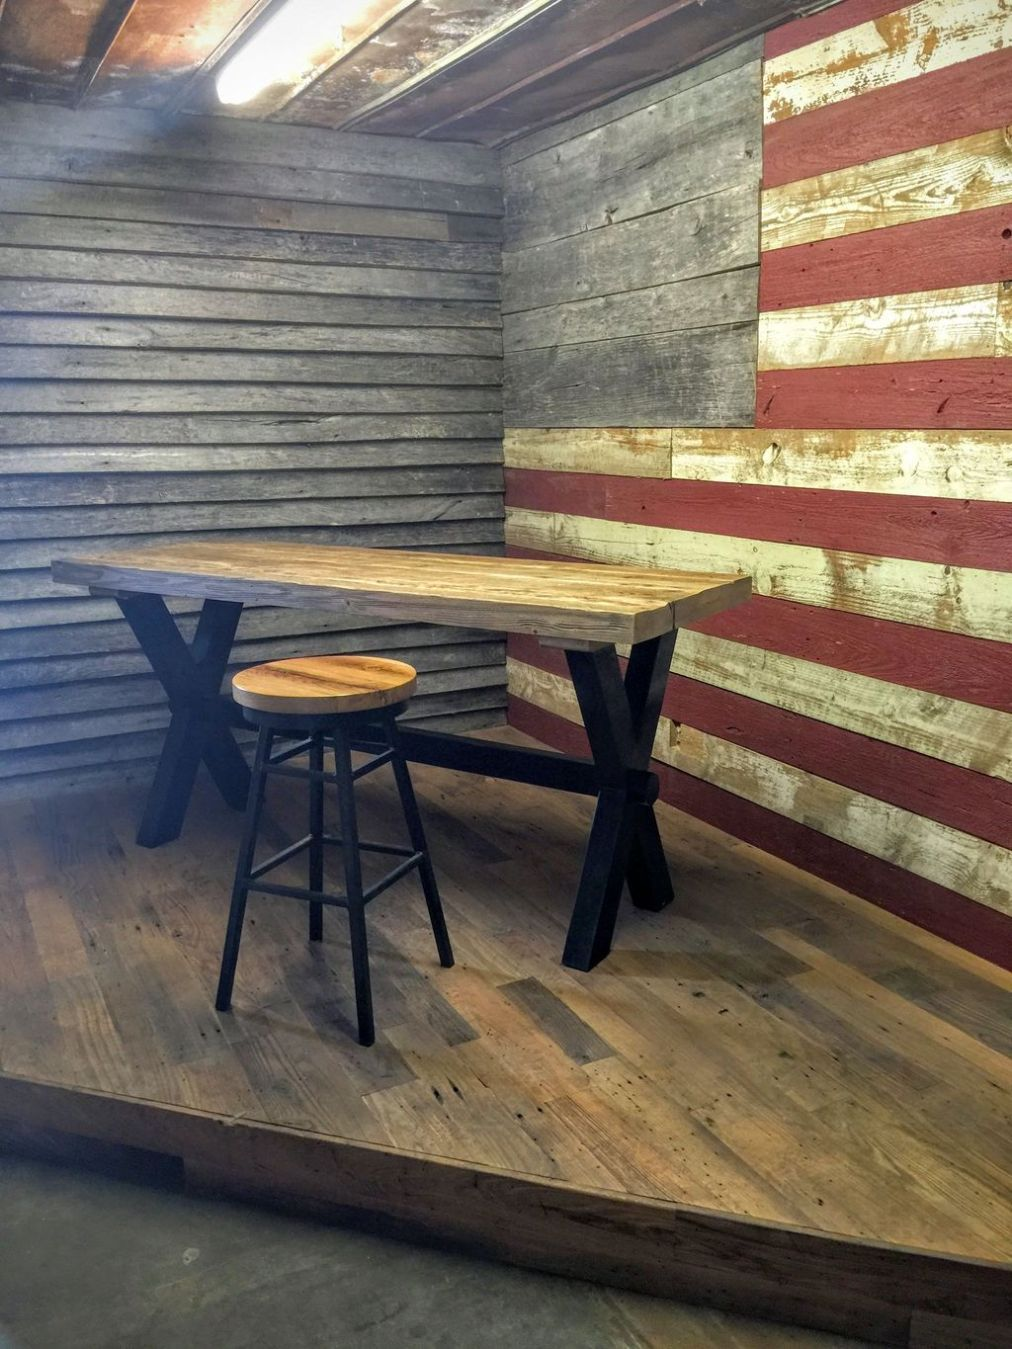 38 Barn Wood Decor Ideas 06 Furniture Inspiration Barn Wood Decor Reclaimed Barn Wood Wood Decor